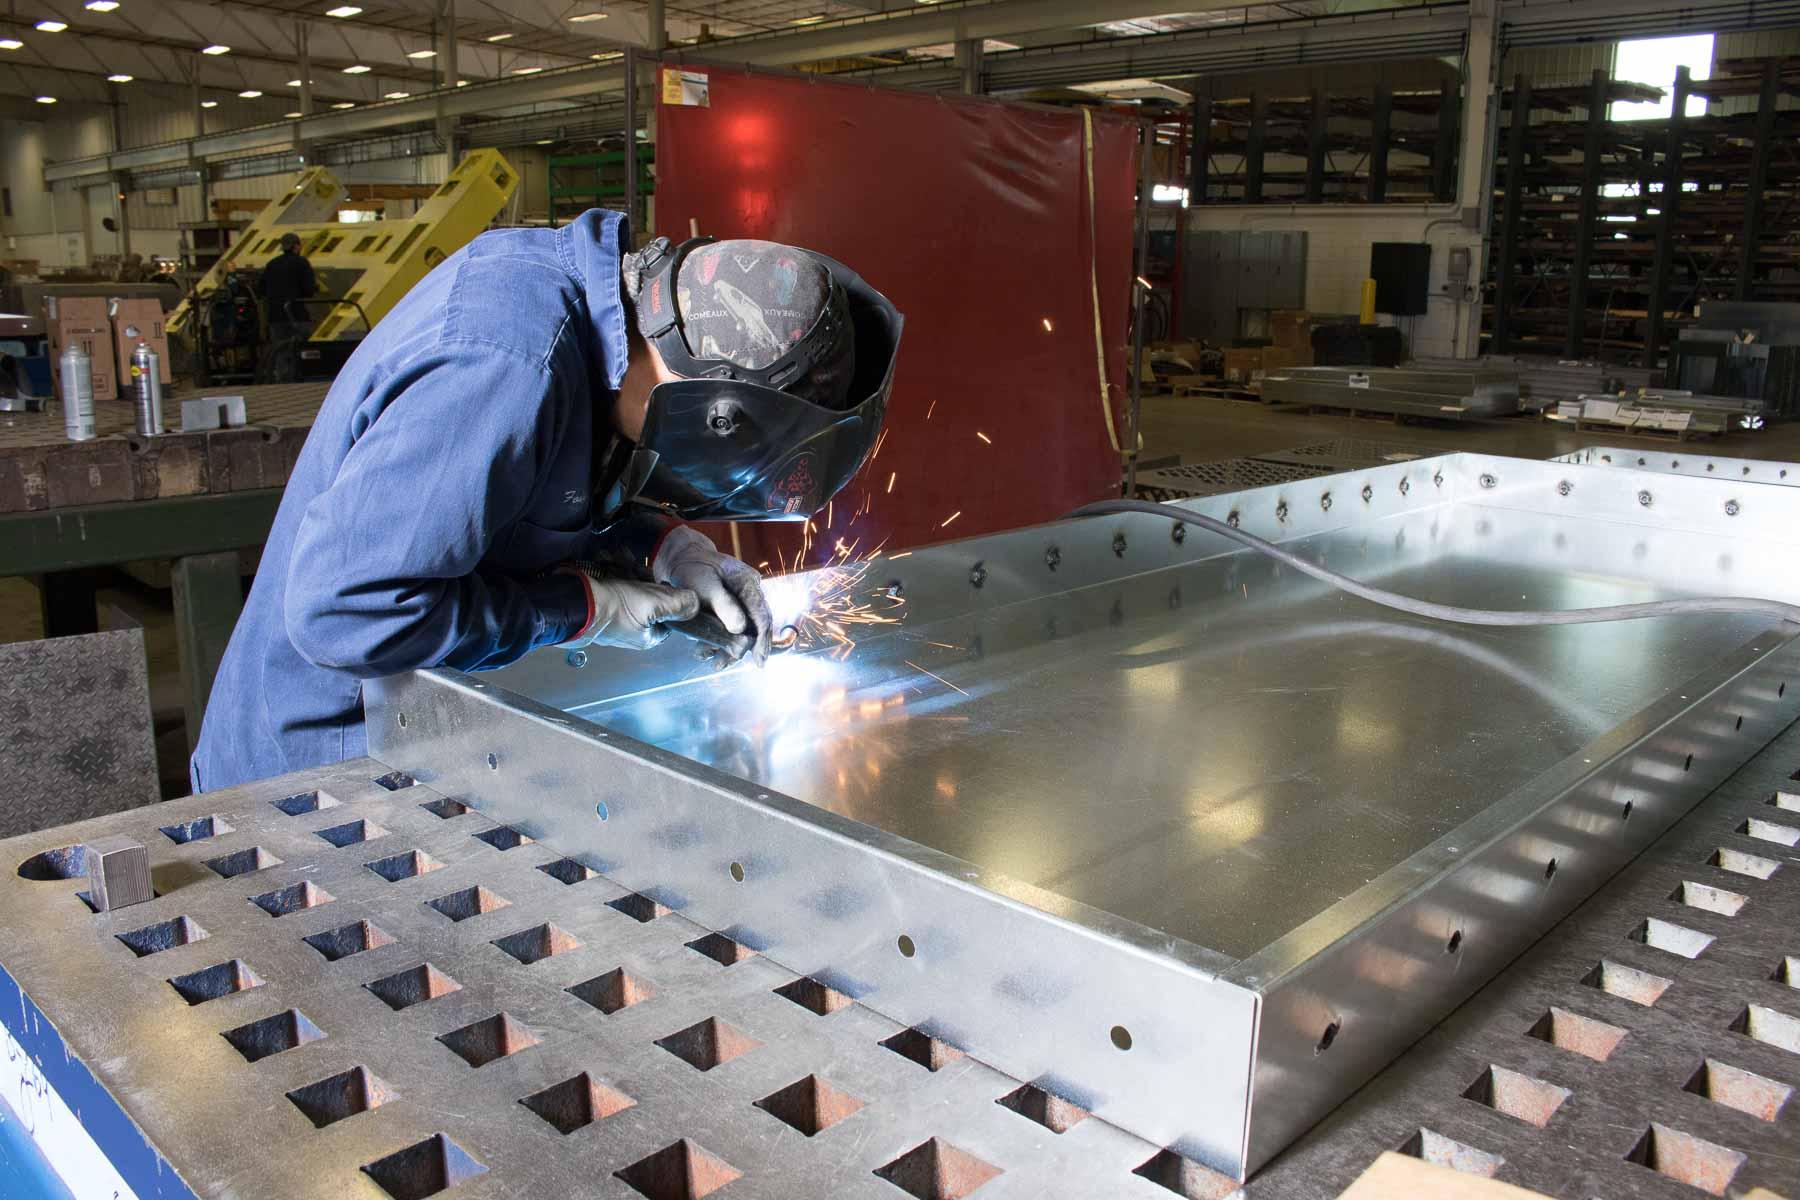 Badger Sheet Metal Works Features Rare Steel Fabrication Shop Capabilities